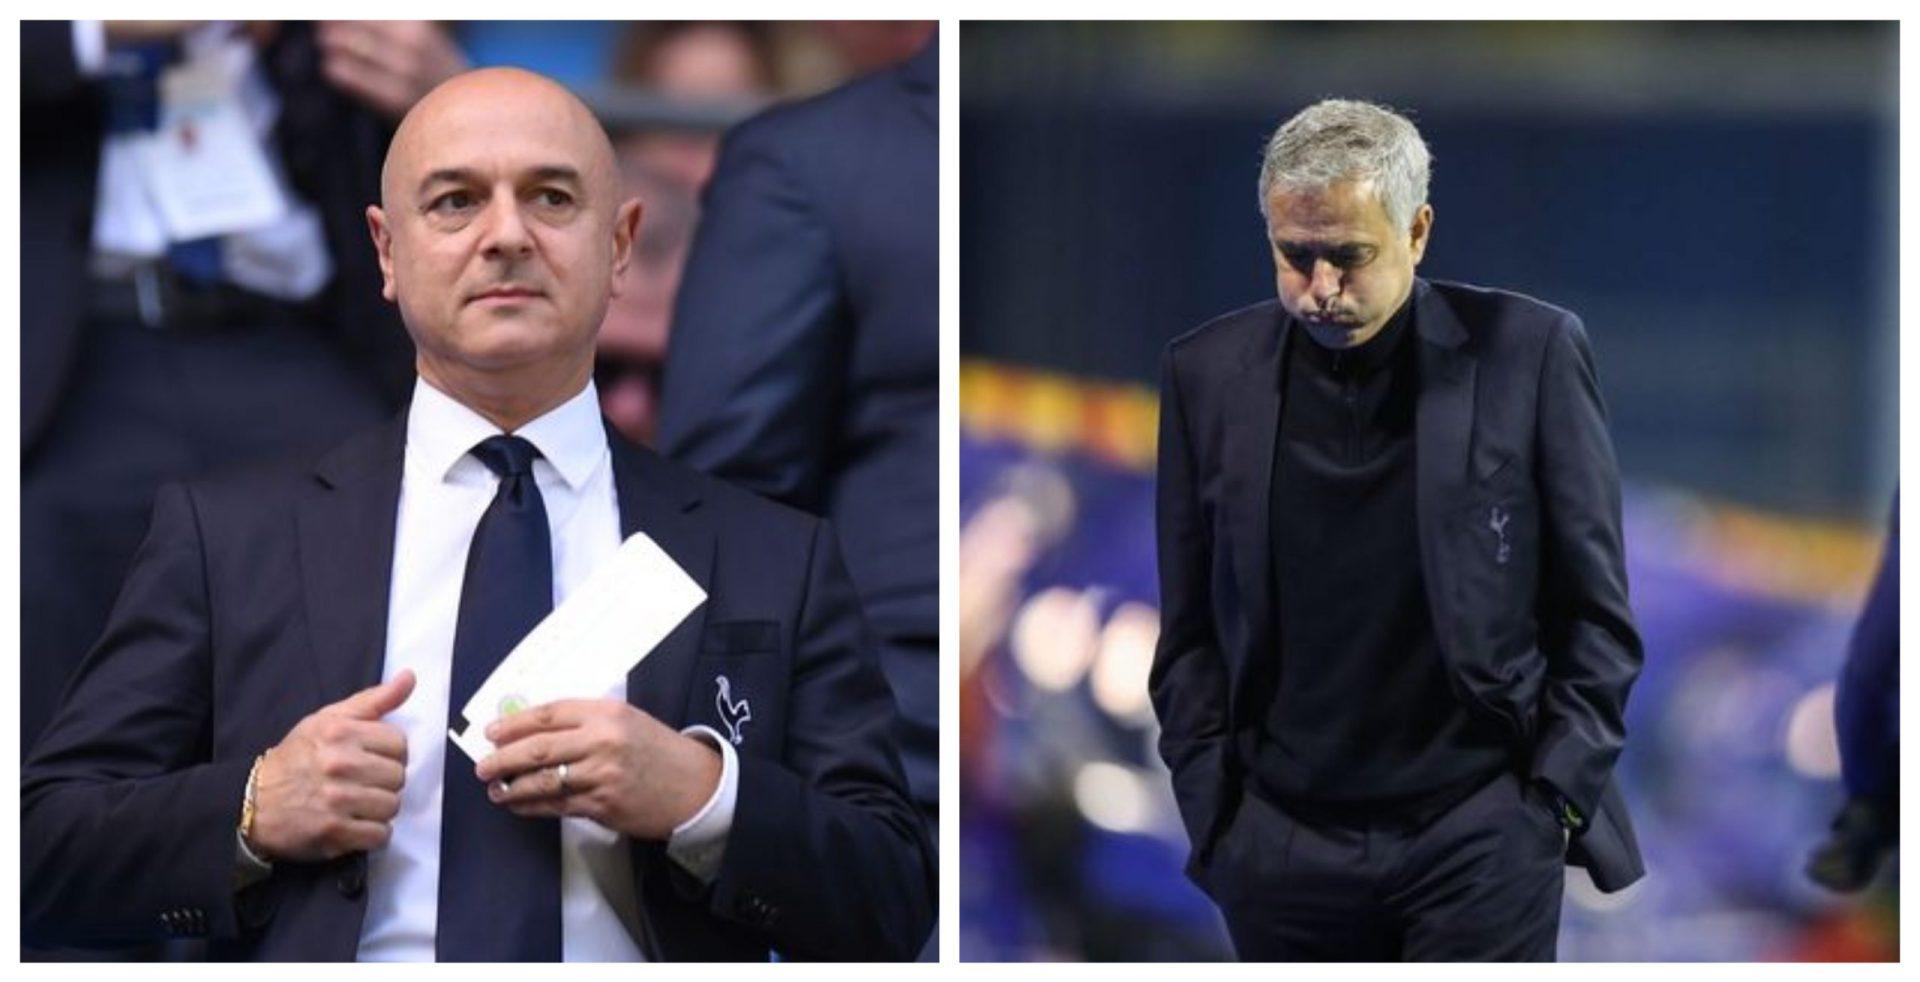 Jose Mourinho sacked by Tottenham Hotspur ahead of Carabao Cup Final - THE SPORTS ROOM